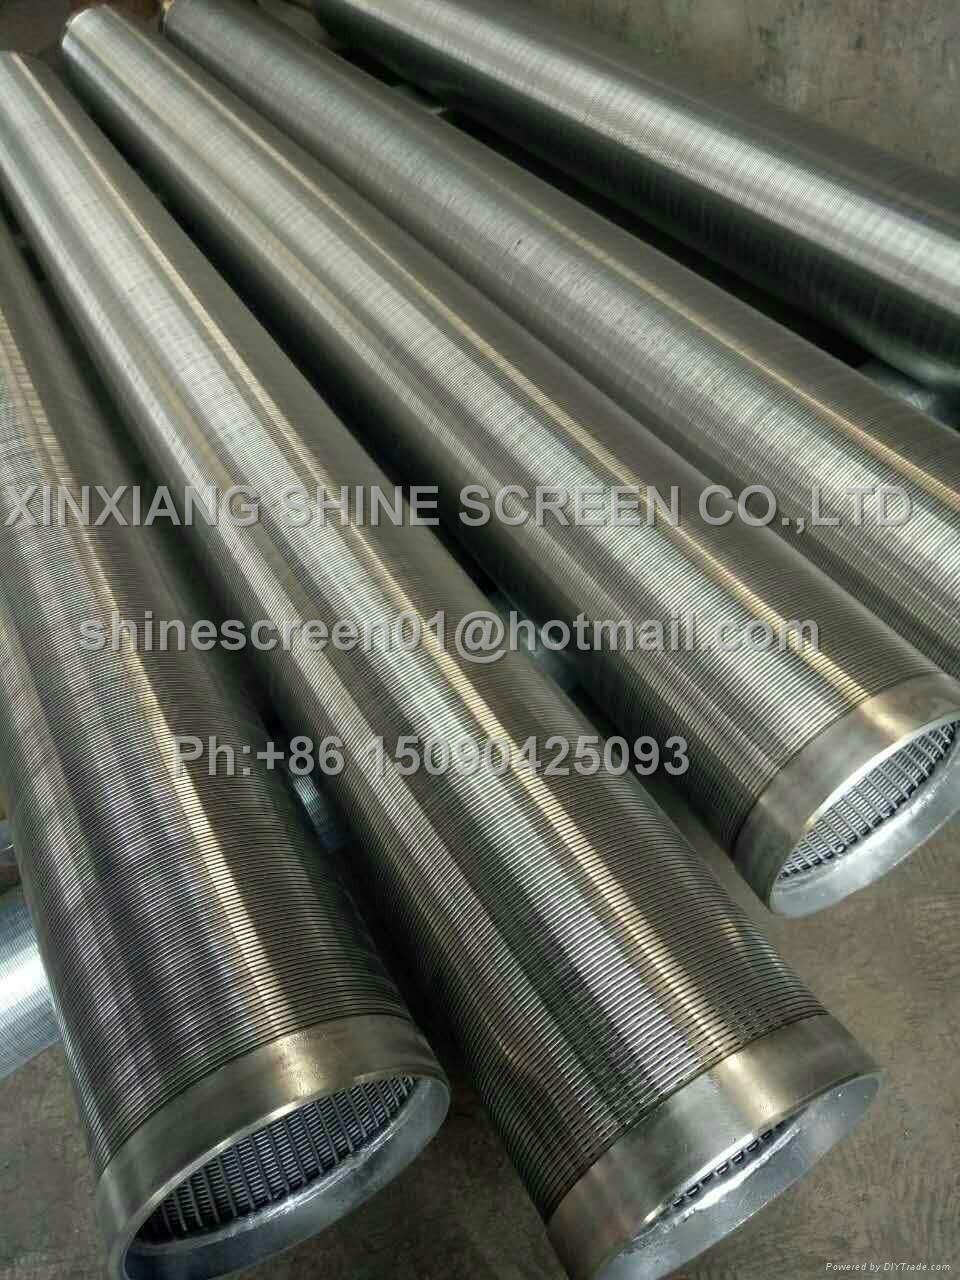 Filter element of sewage treatment filter equipment 1